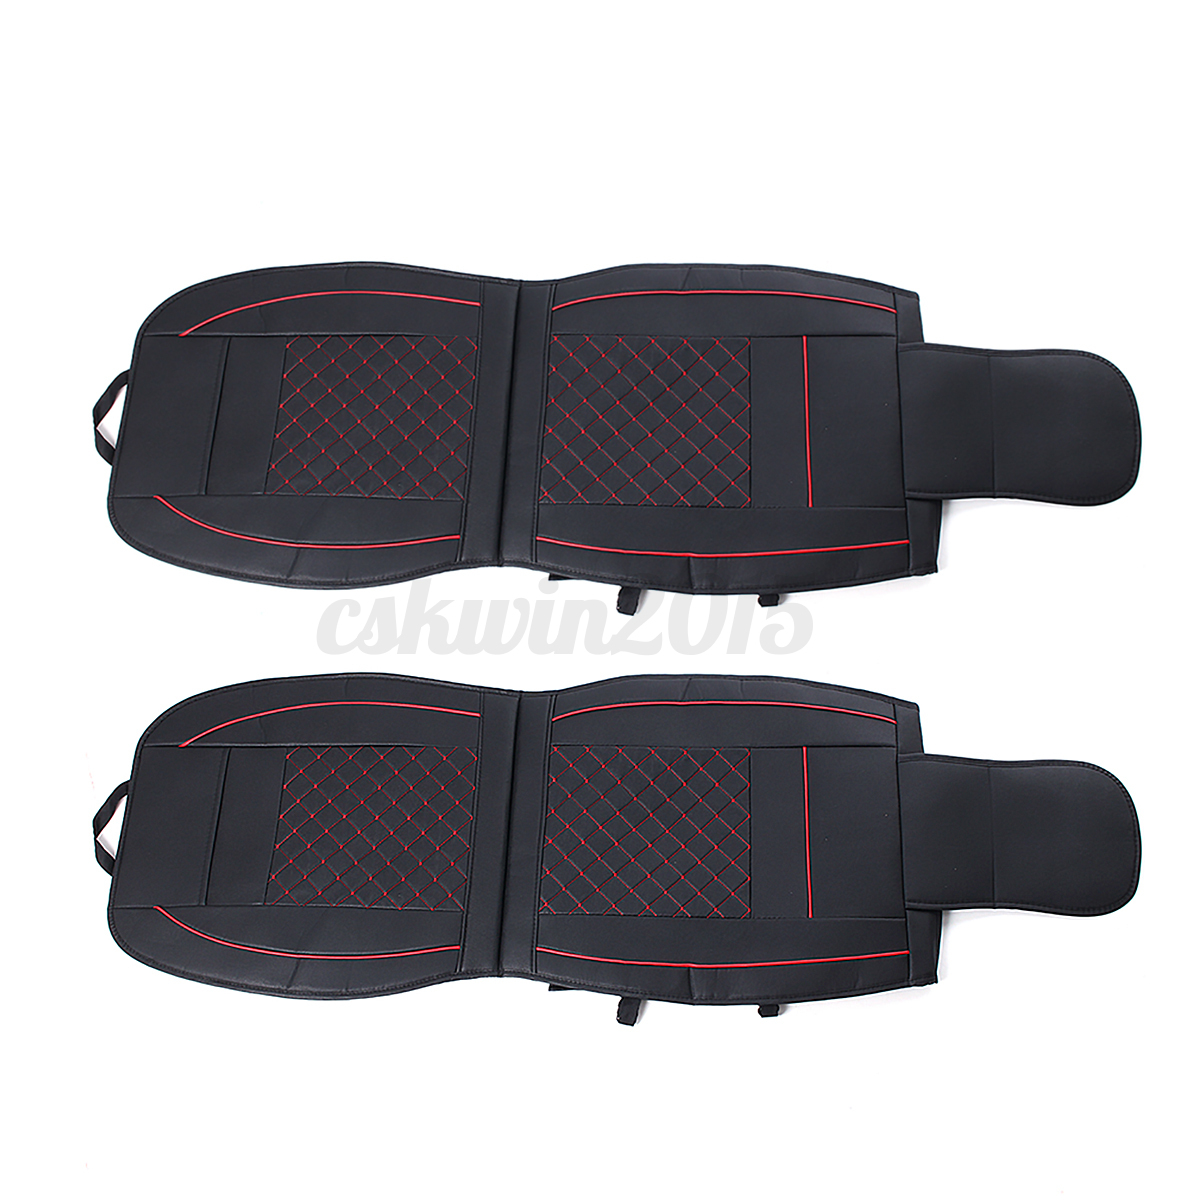 Flame Retardant Car Seat Covers